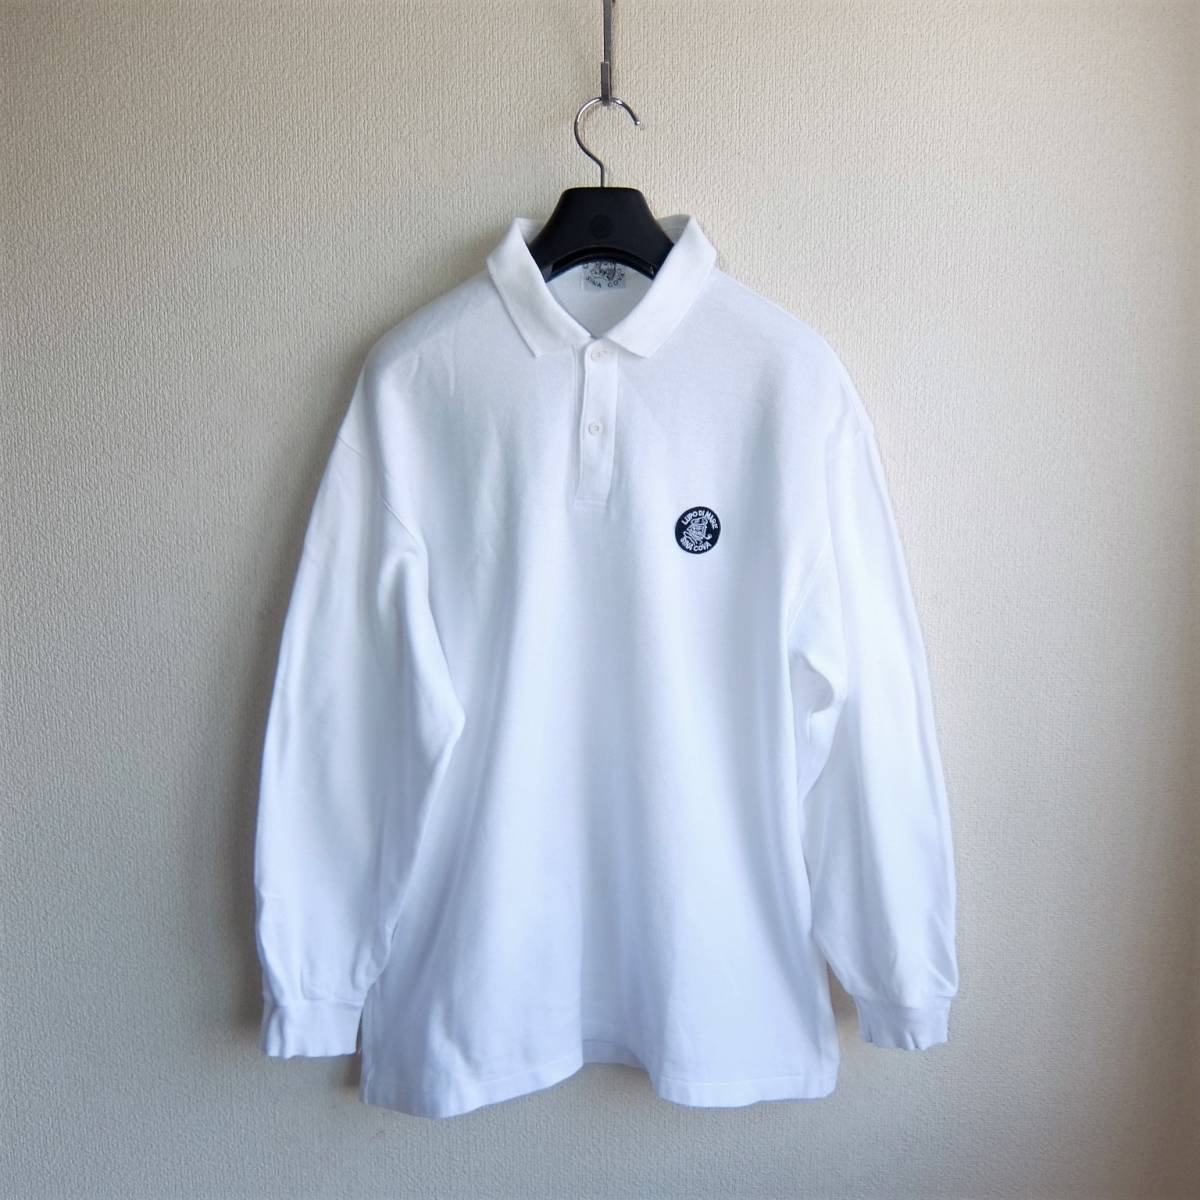 SINA COVA シナコバ ワッペン付き 長袖 ポロシャツ ホワイト Lサイズ_画像2